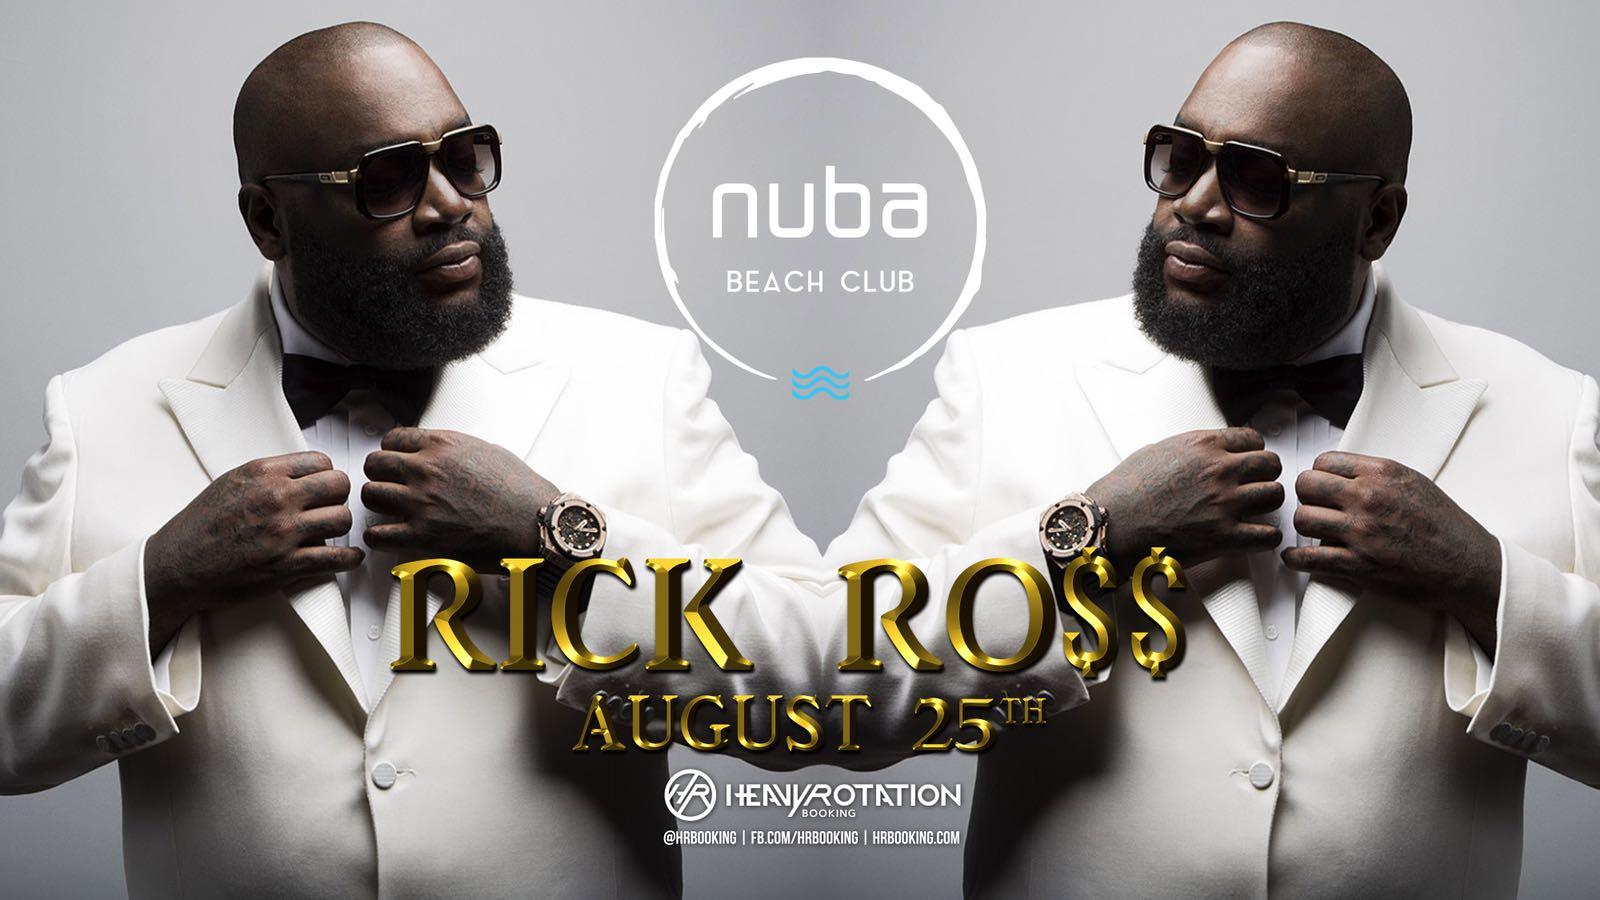 rick ross nuba beach club - Rick Ross vine cu Lamborghini-ul direct pe scena NUBA Beach Club